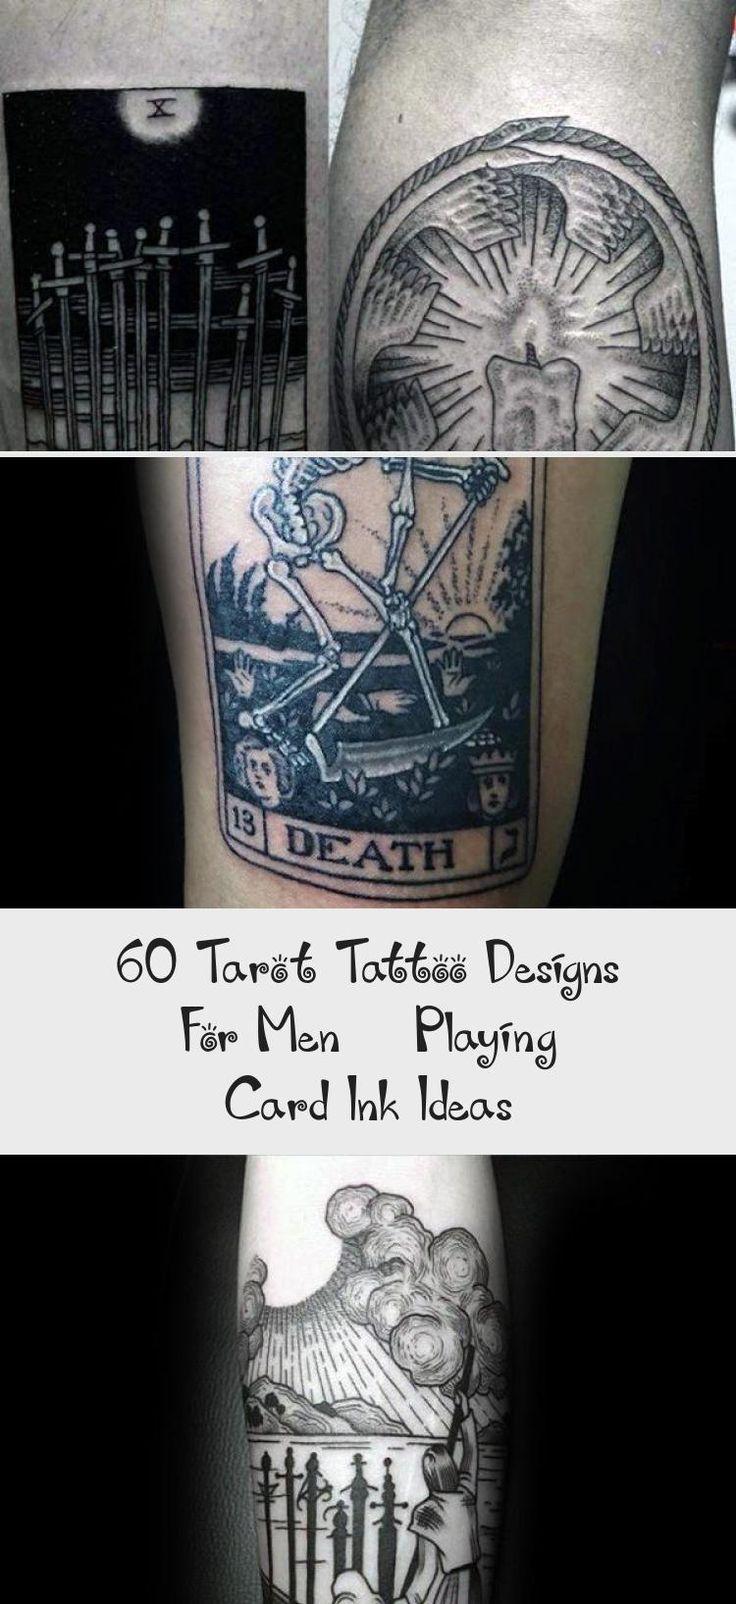 60 tarot tattoo designs for men playing card ink ideas